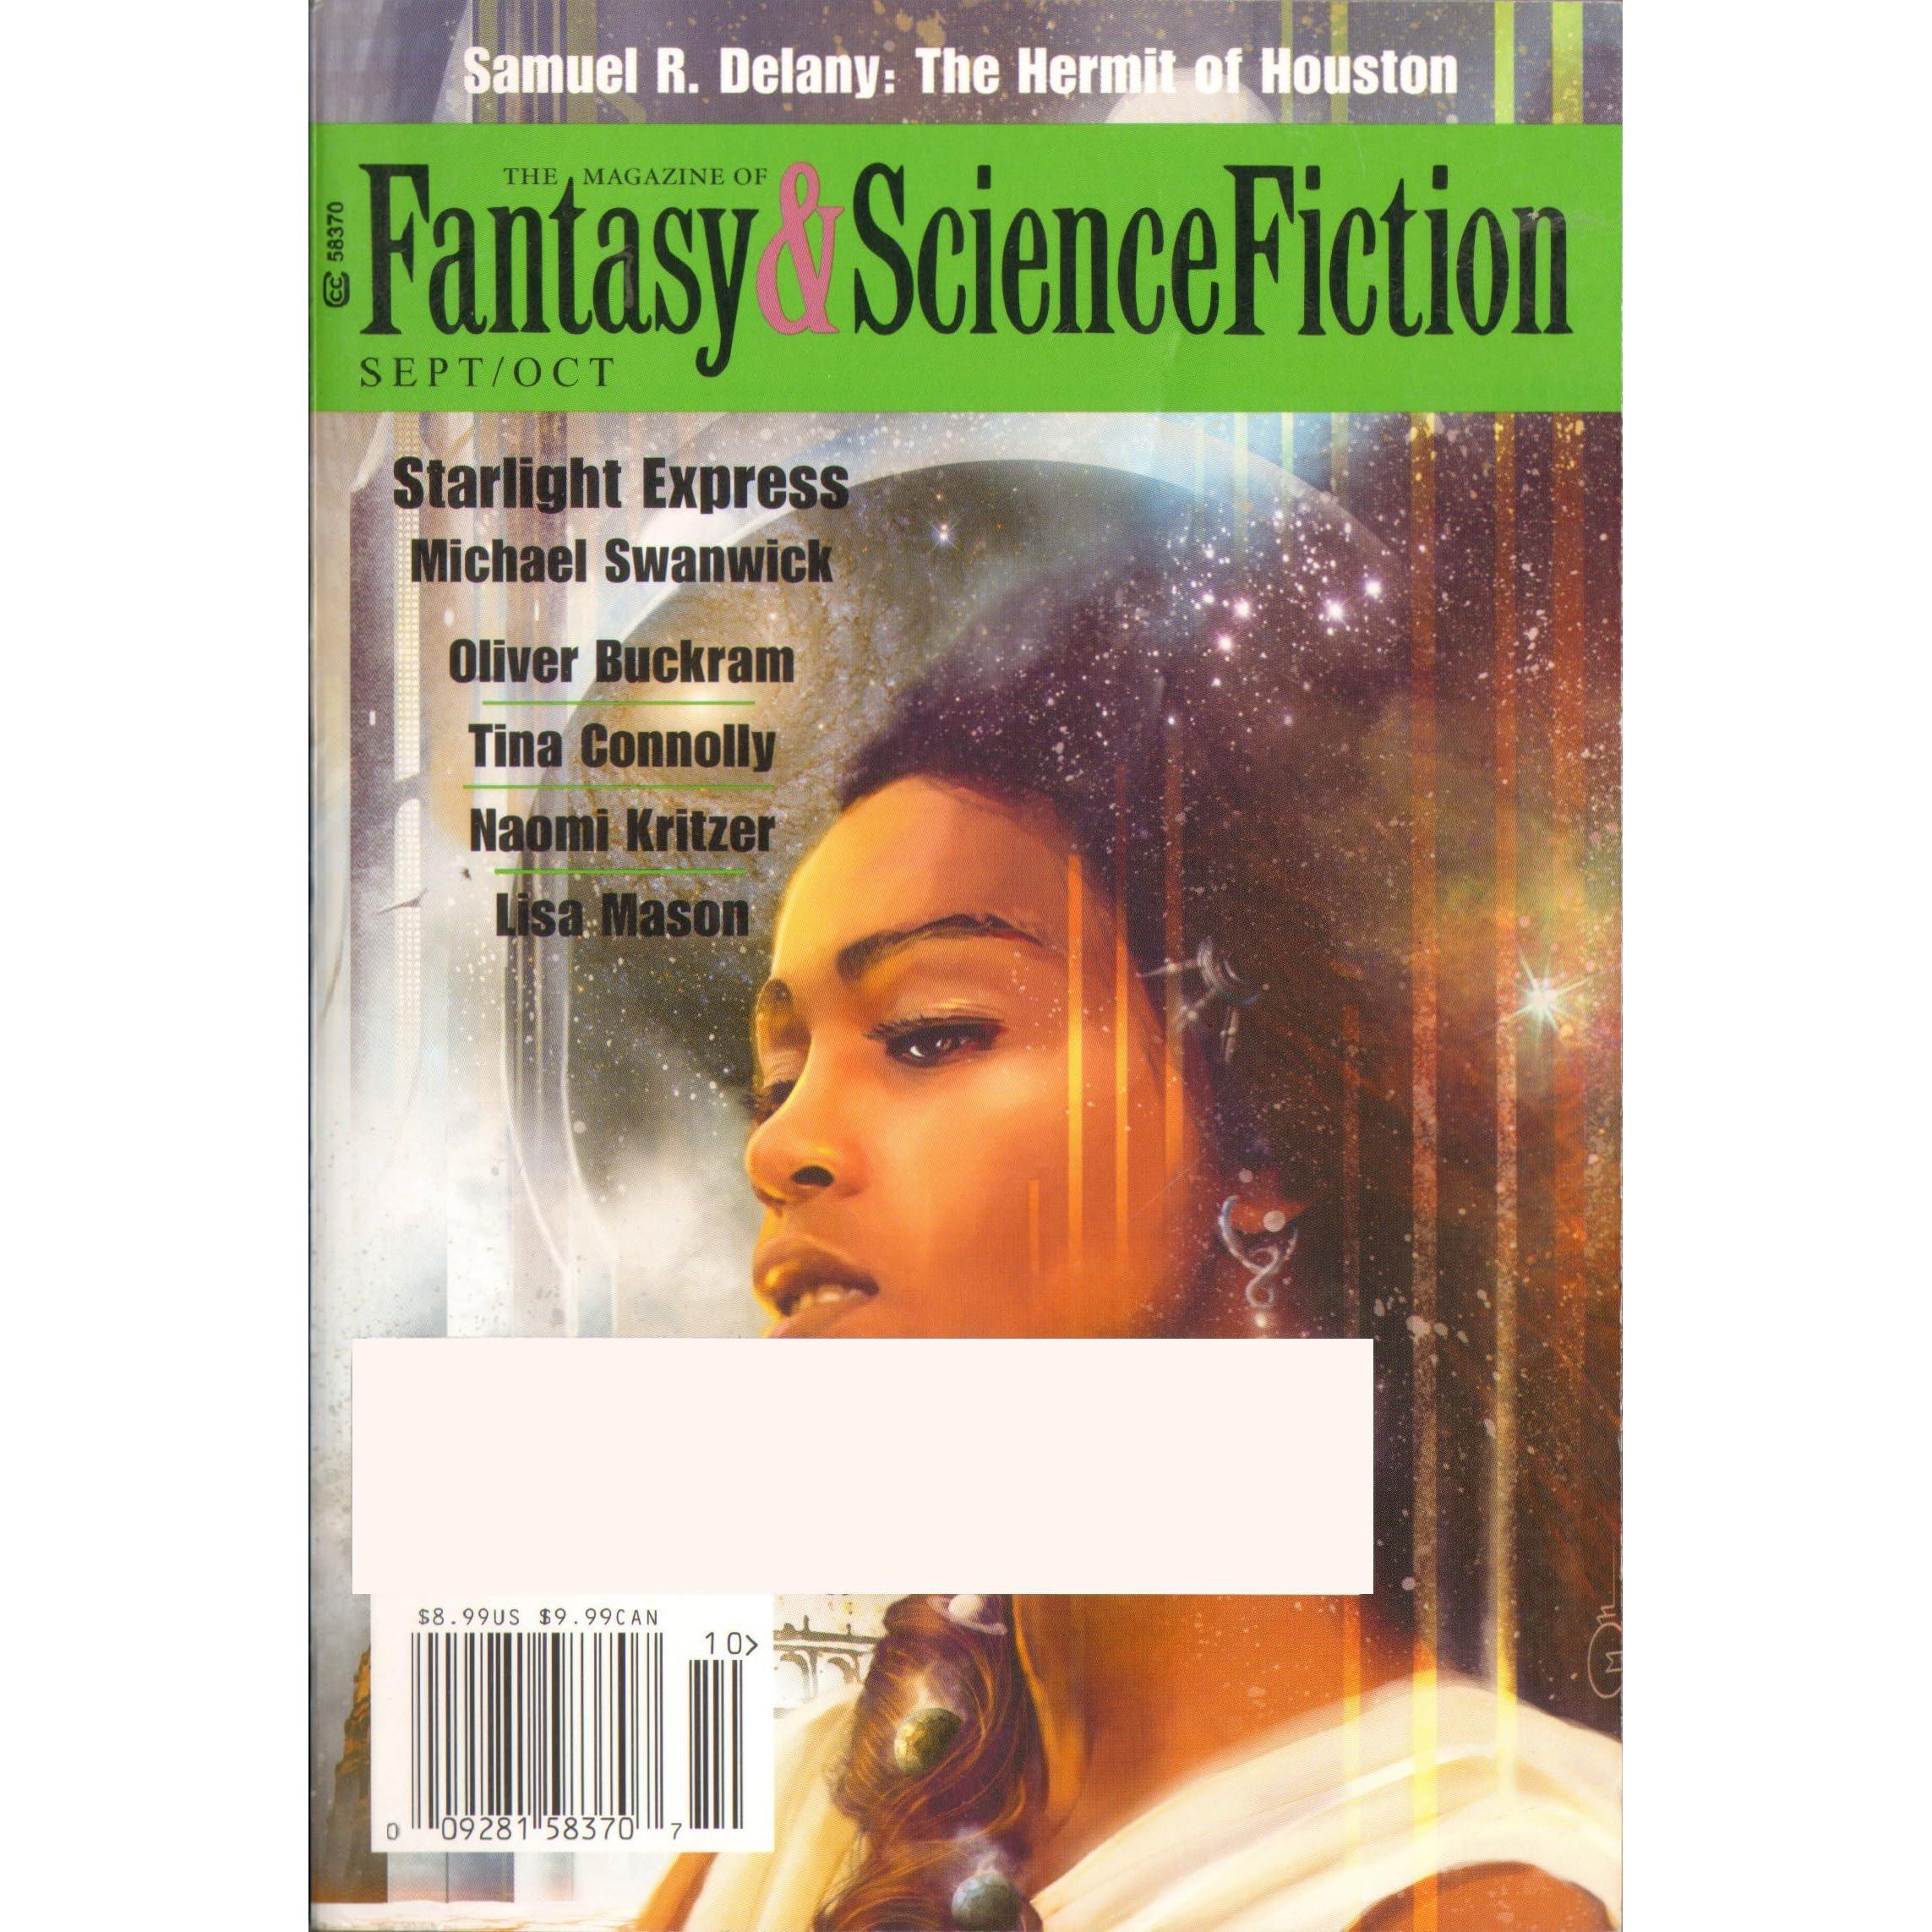 The Magazine of Fantasy & Science Fiction, September/October